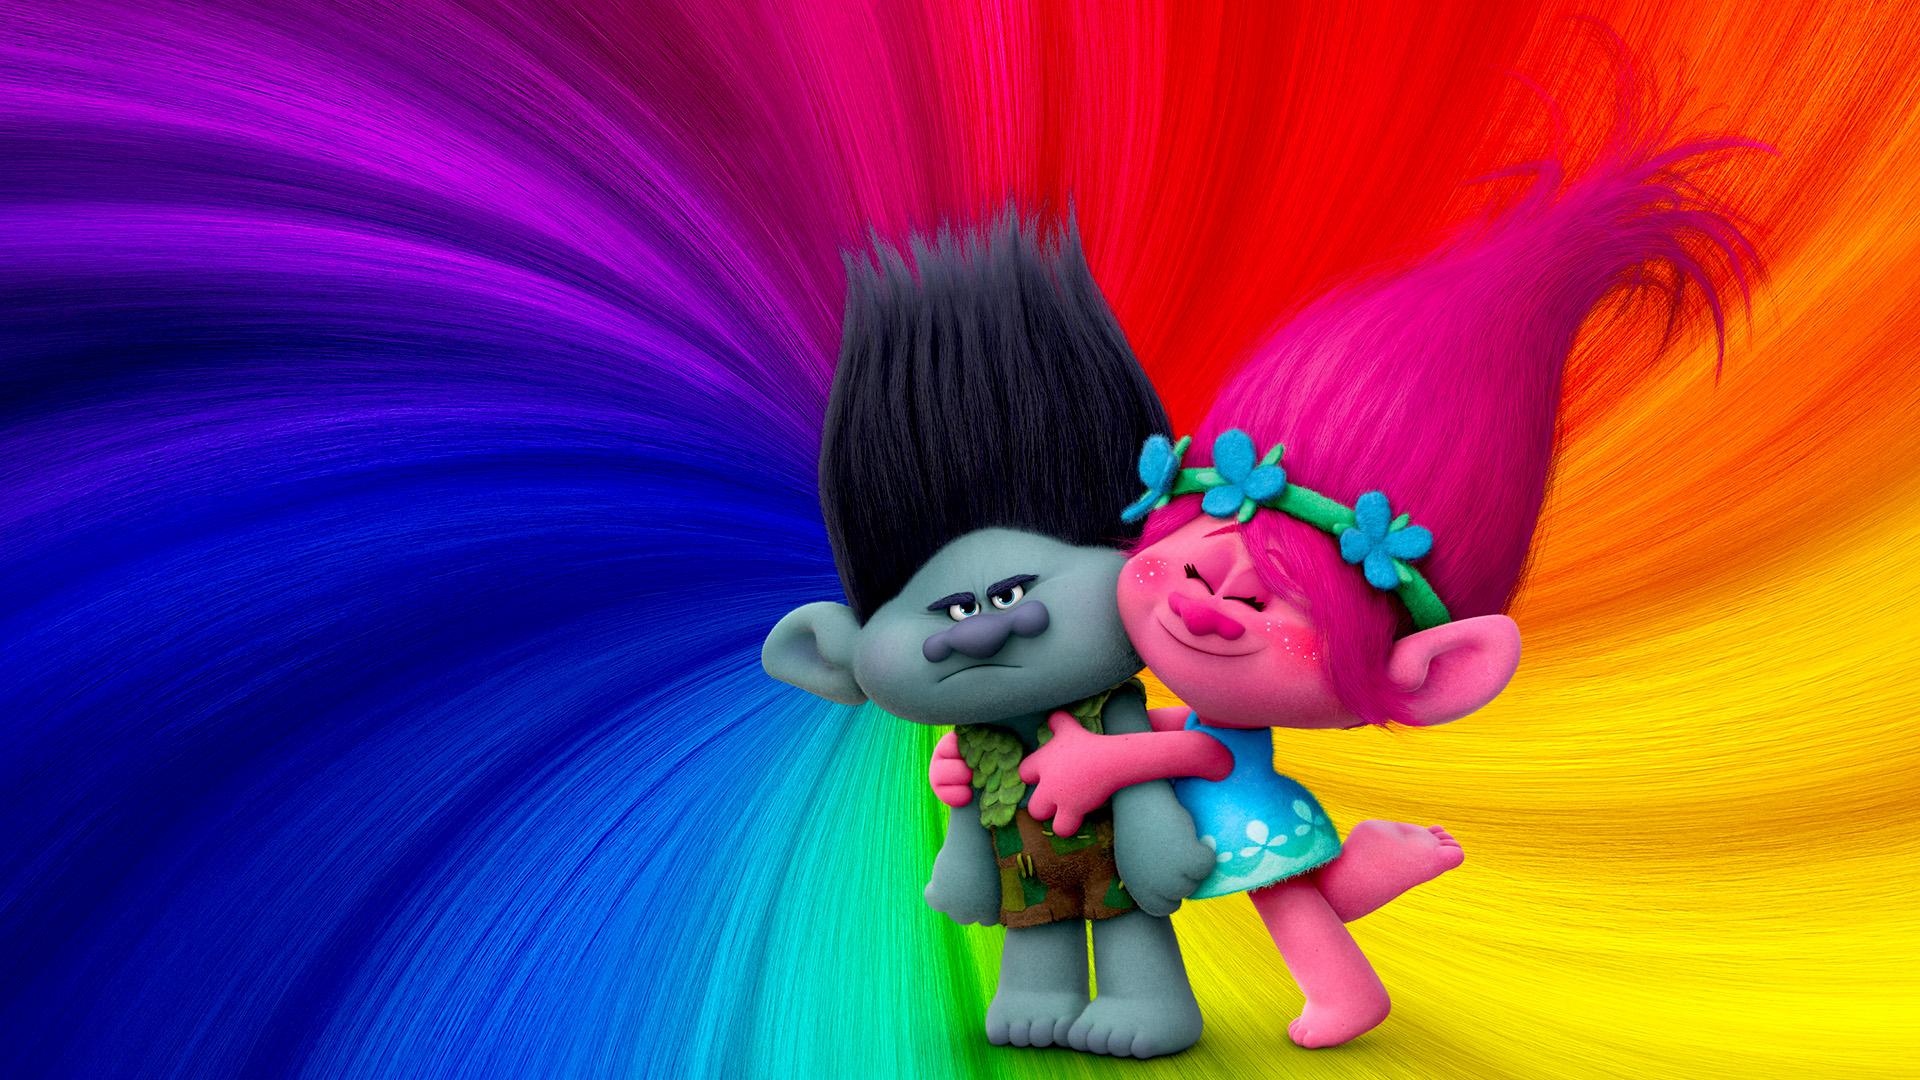 Trolls Full Hd Wallpaper And Background Image 1920x1080 HD Wallpapers Download Free Images Wallpaper [1000image.com]